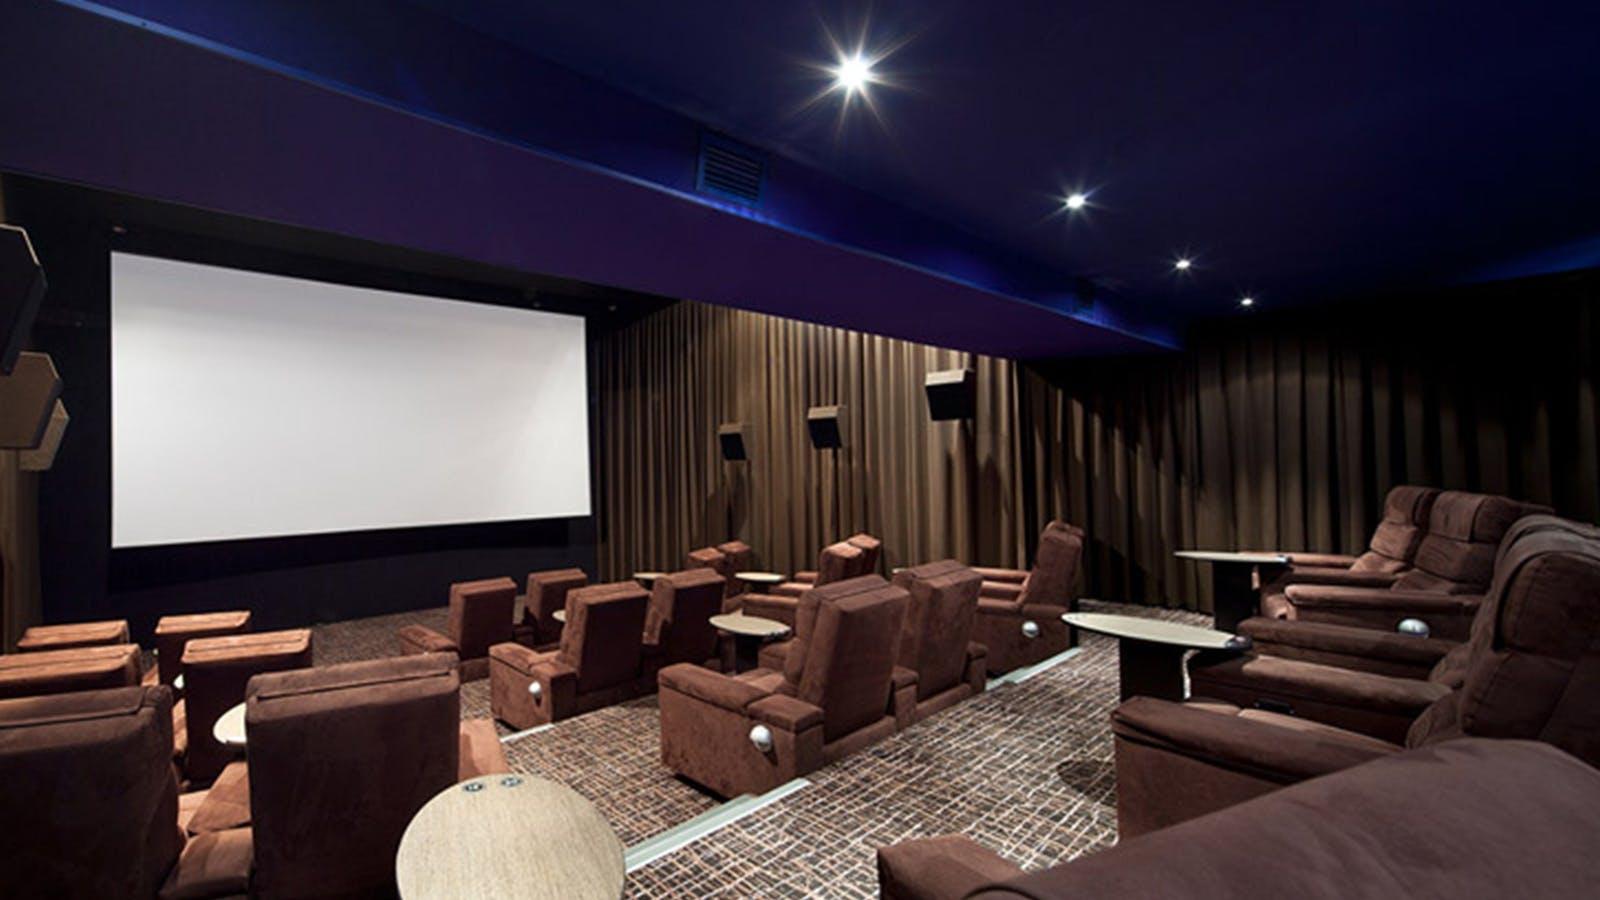 Gold class cinema sets the standard